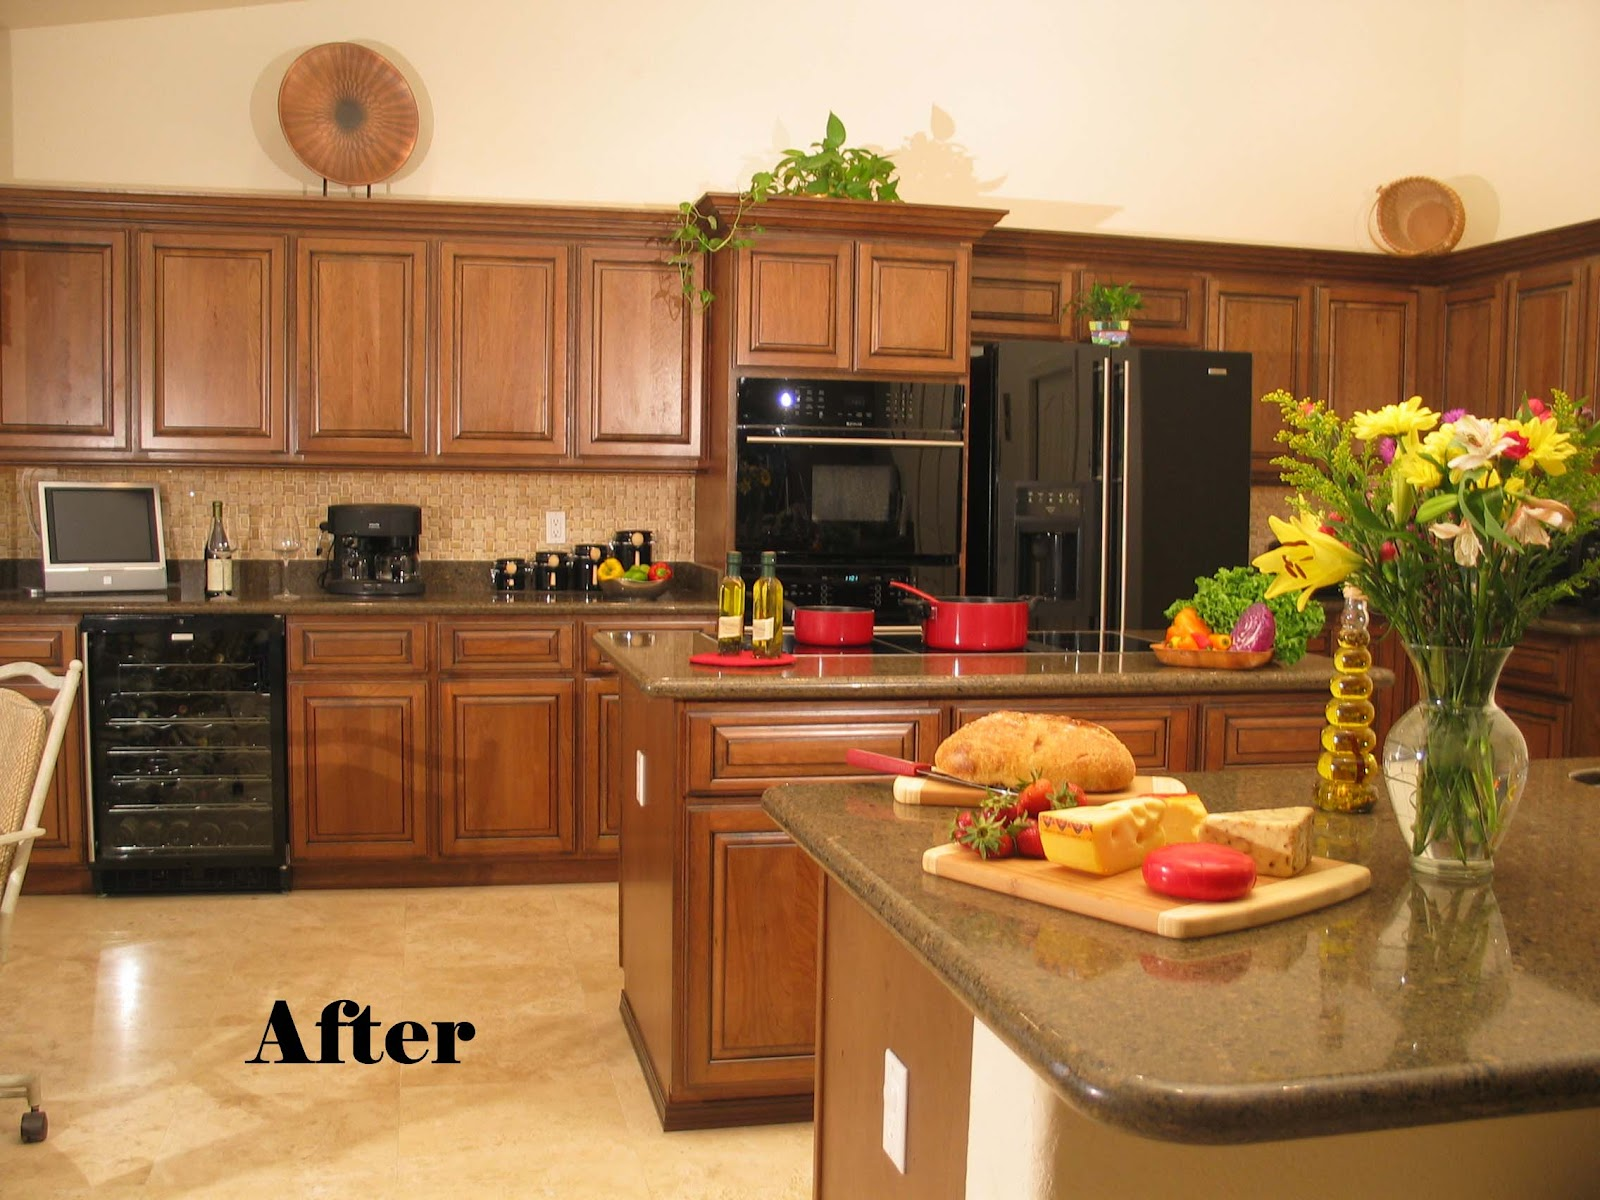 Rawdoorsnet Blog What is Kitchen Cabinet Refacing or